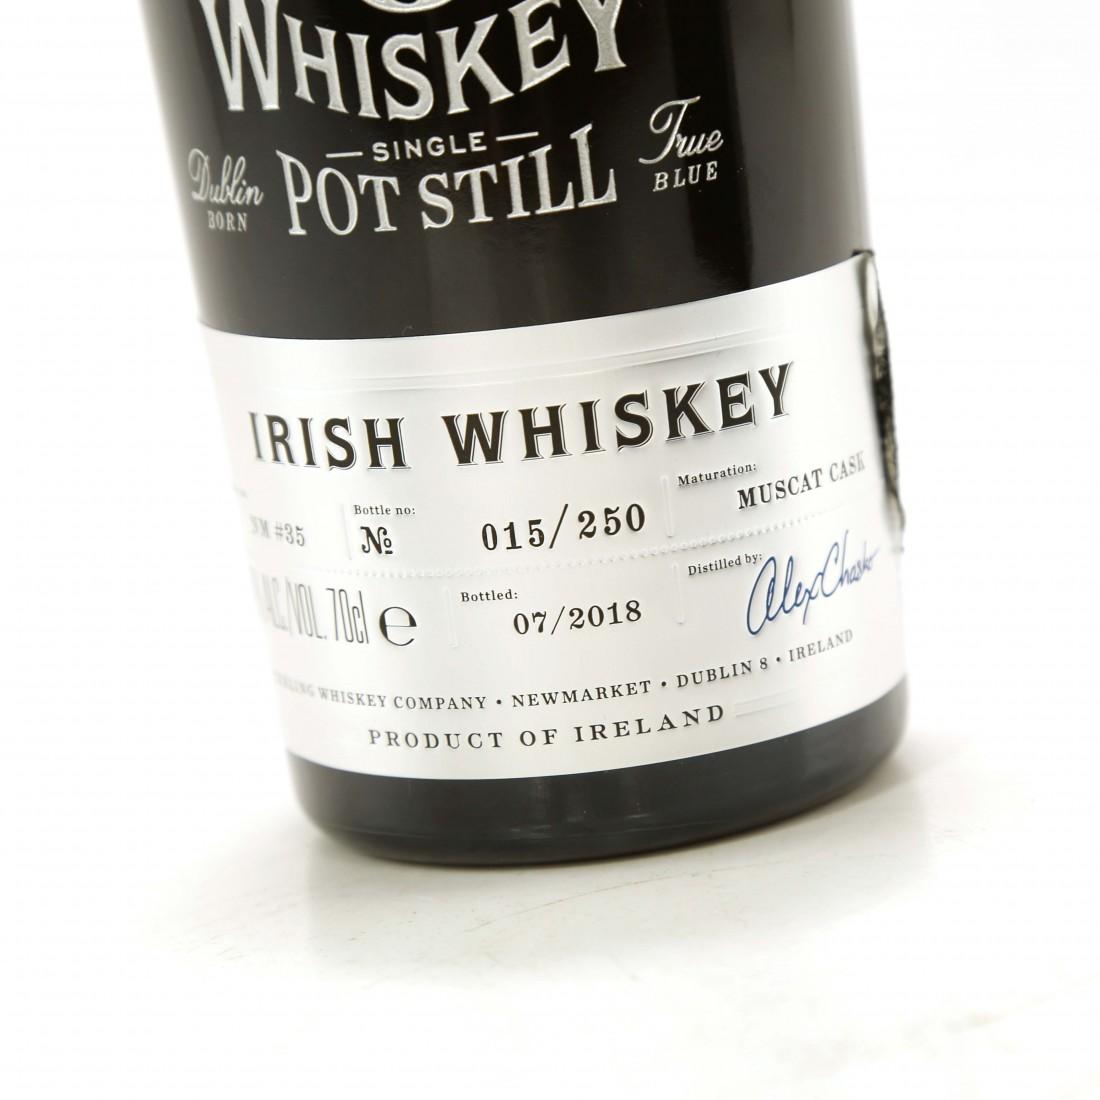 Teeling Celebratory Single Pot Still Whiskey / Bottle #015